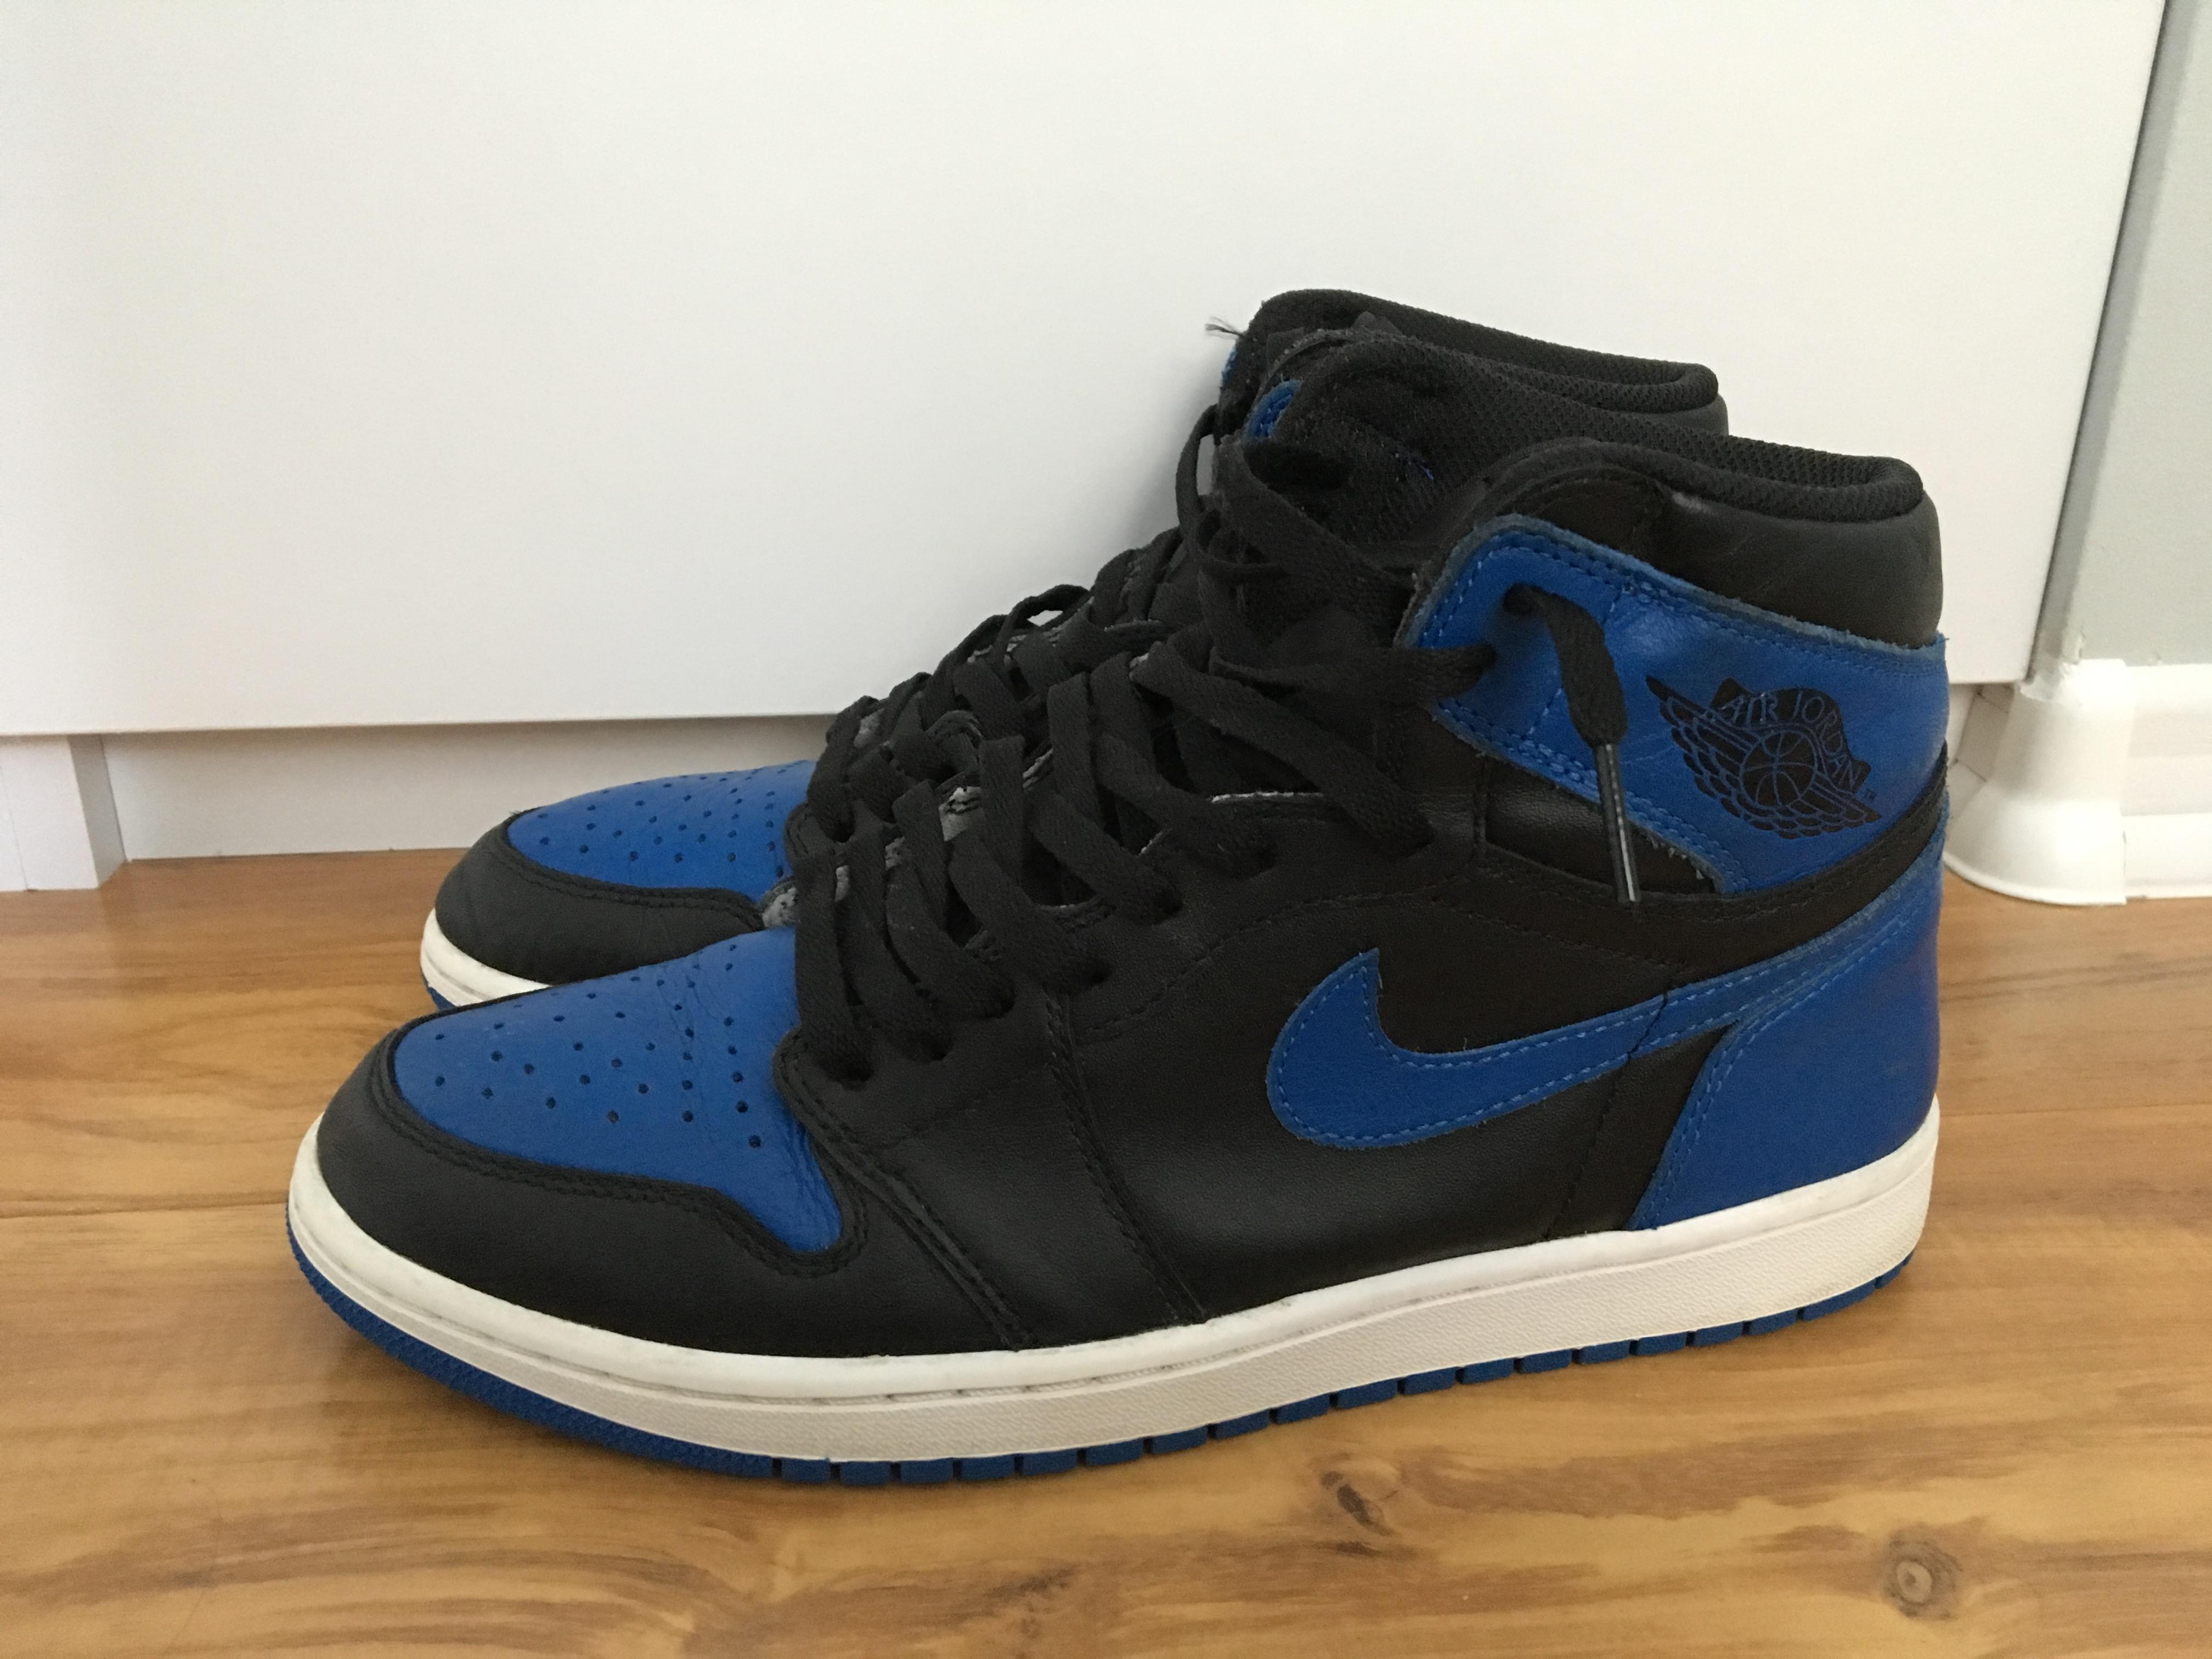 cdf280ced4b Jordan Brand Nike Air Jordan 1 Retro High Og Royal Blue Black 555088 ...